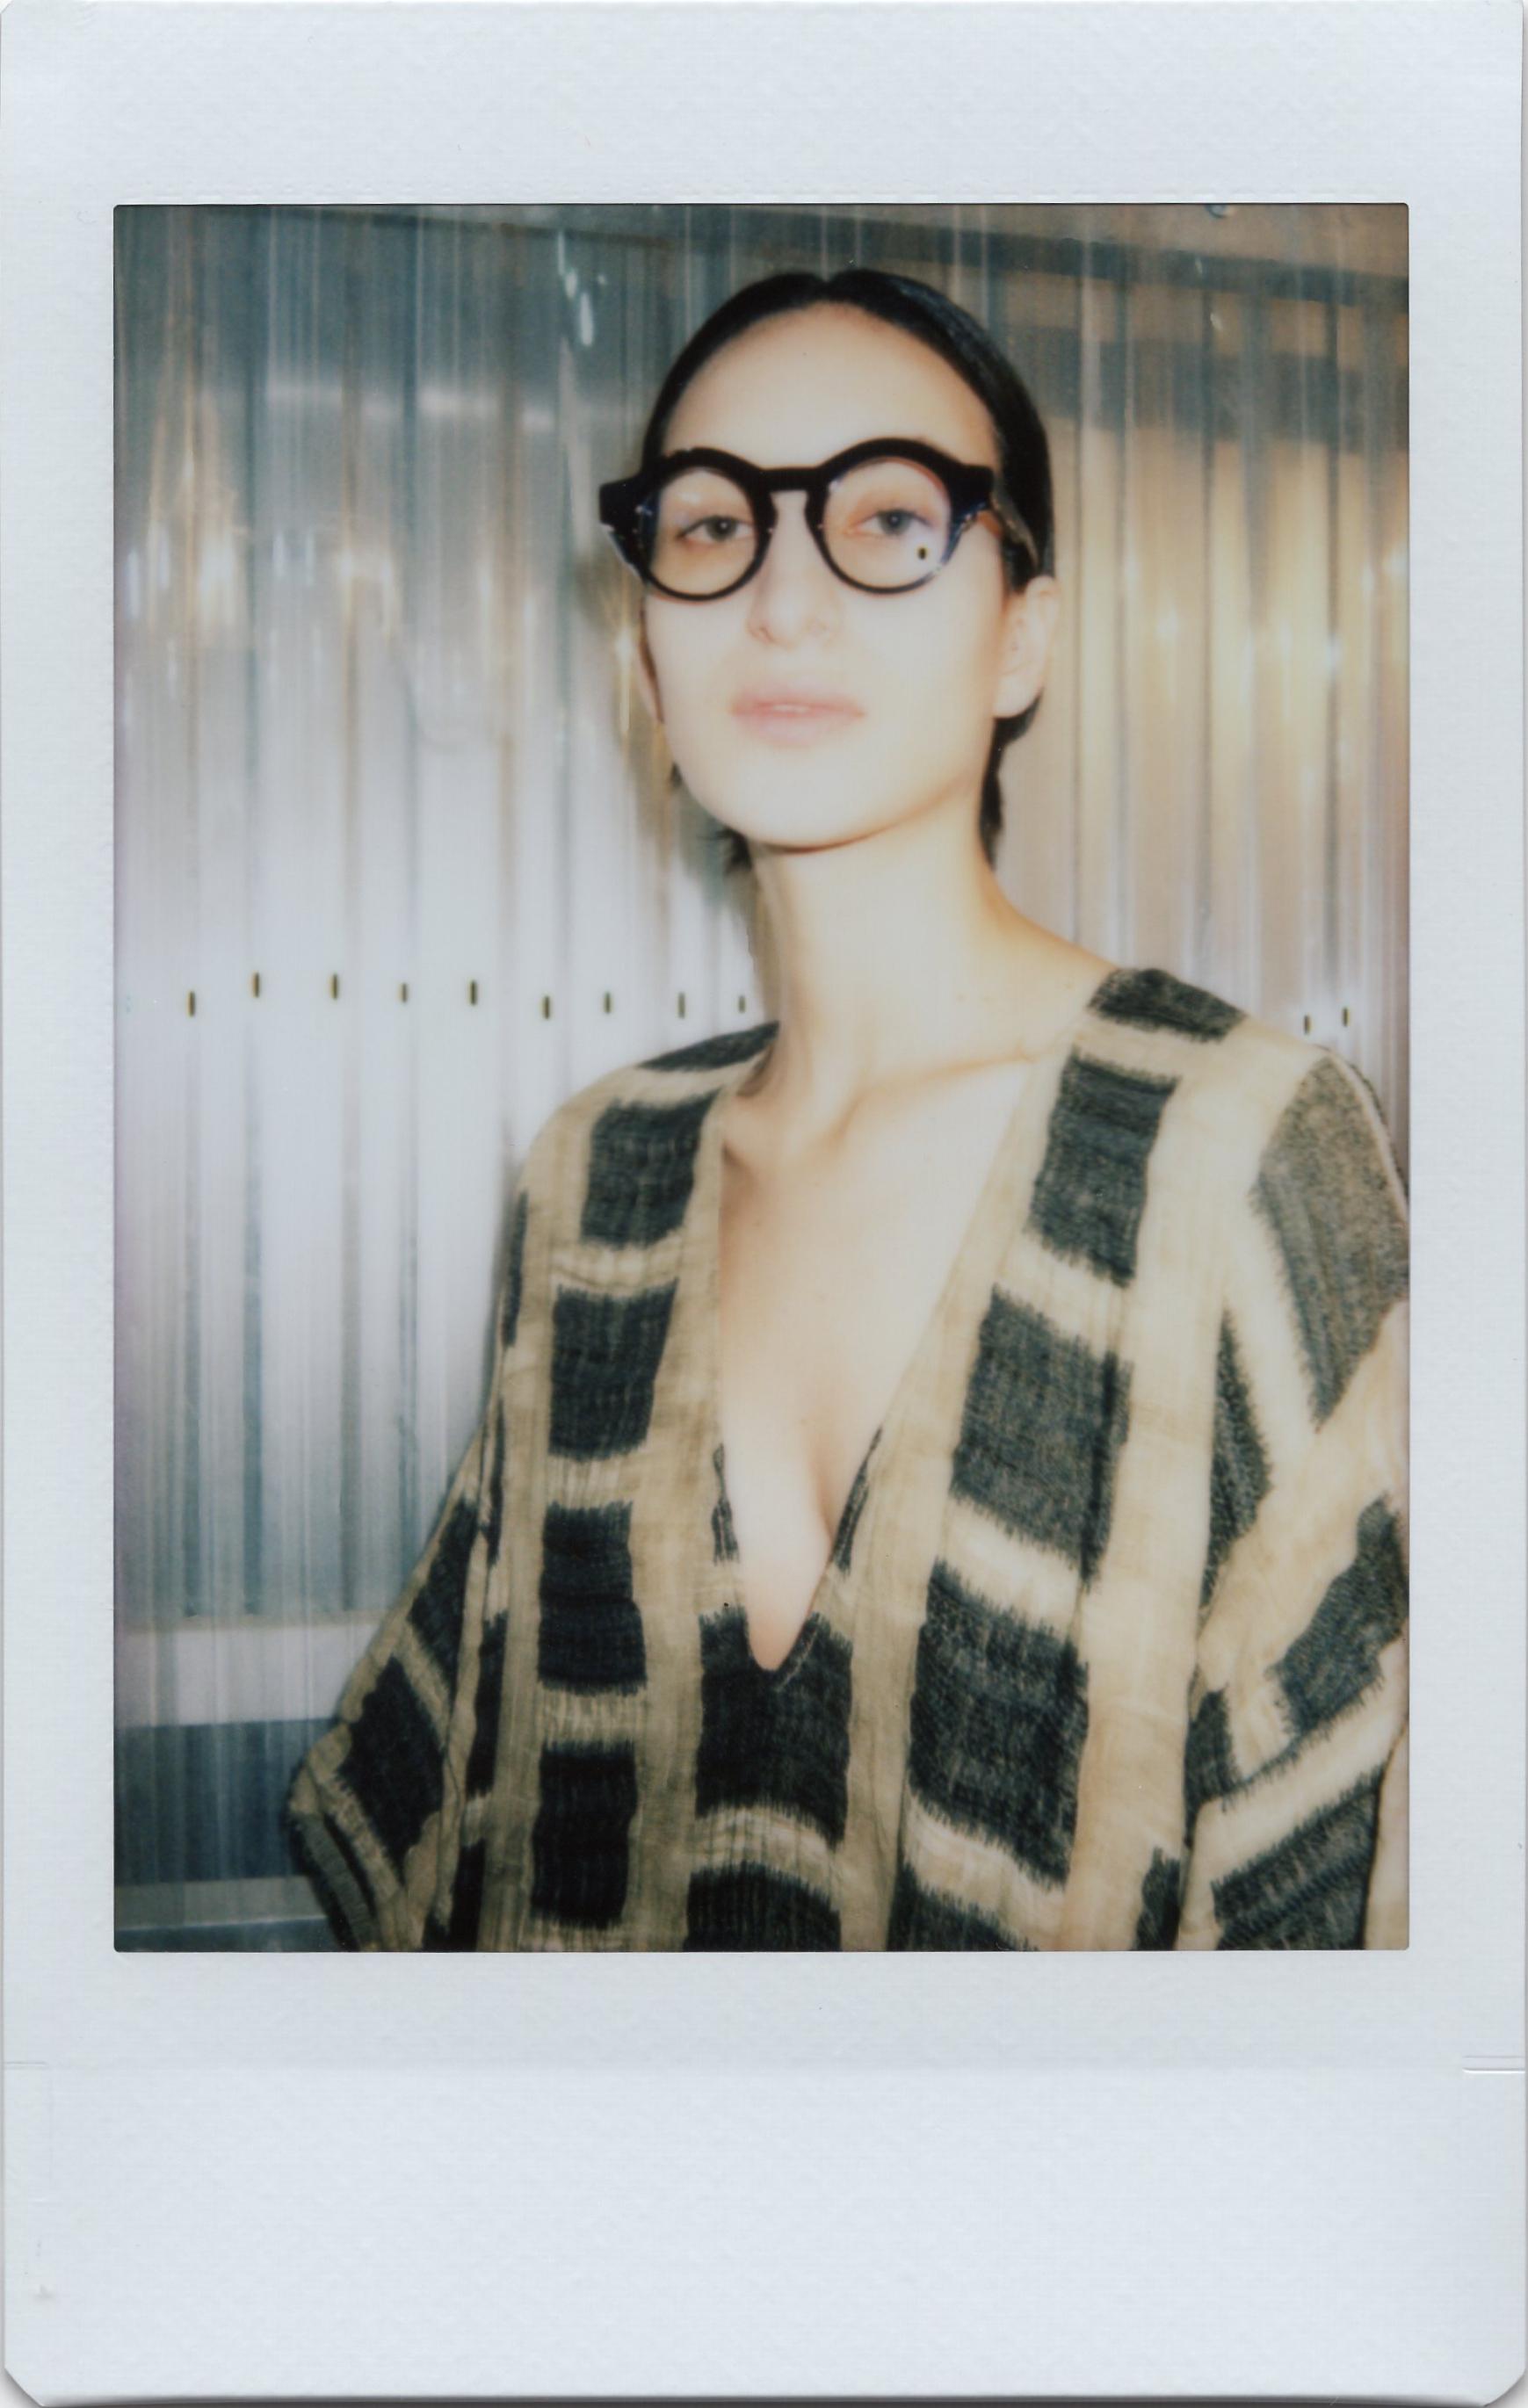 UmaWang_Honigschreck_Polaroid_2.jpg